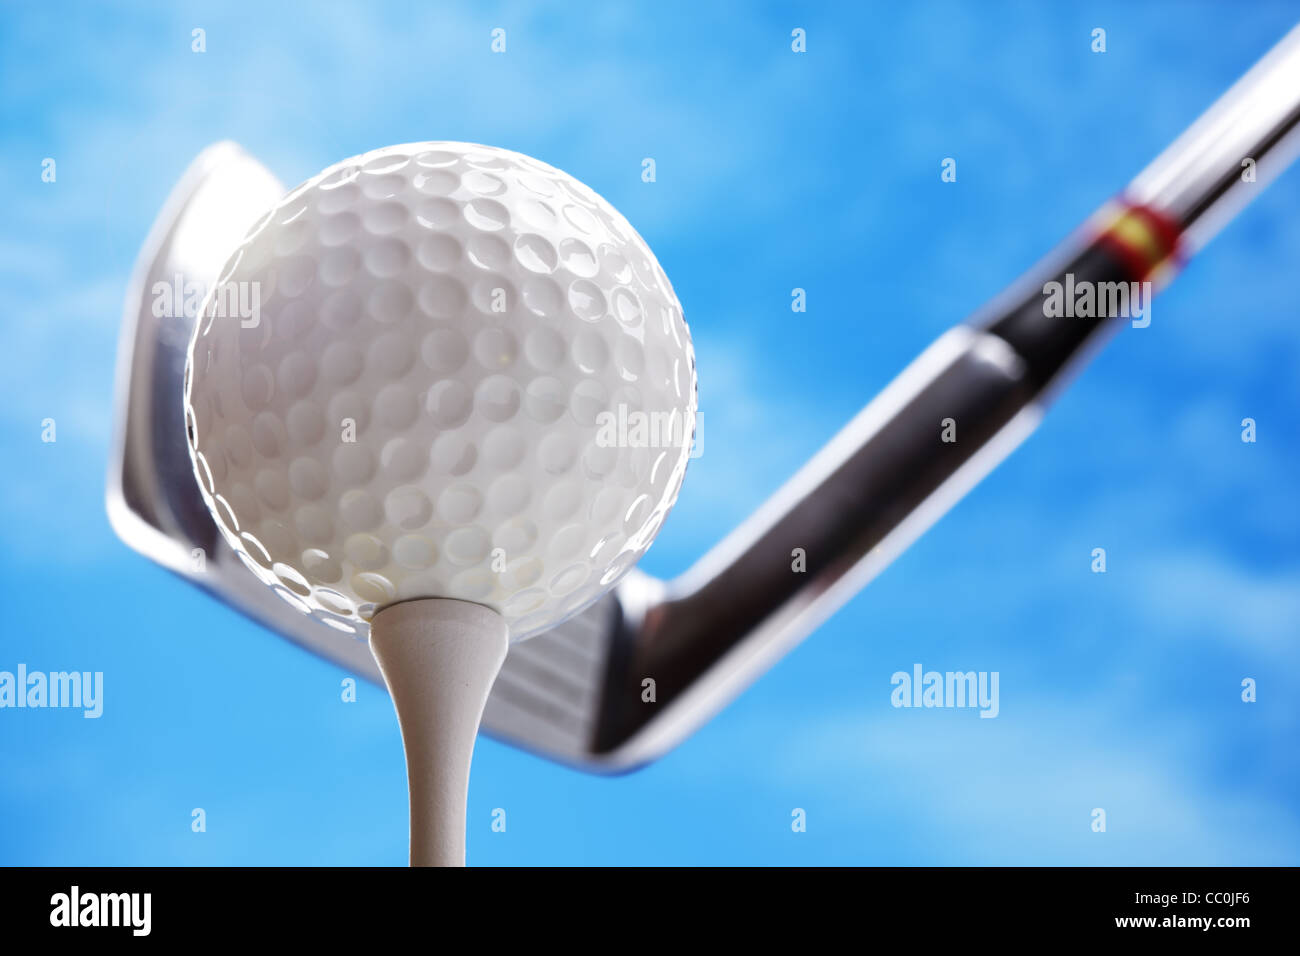 Pelota de golf y club Imagen De Stock